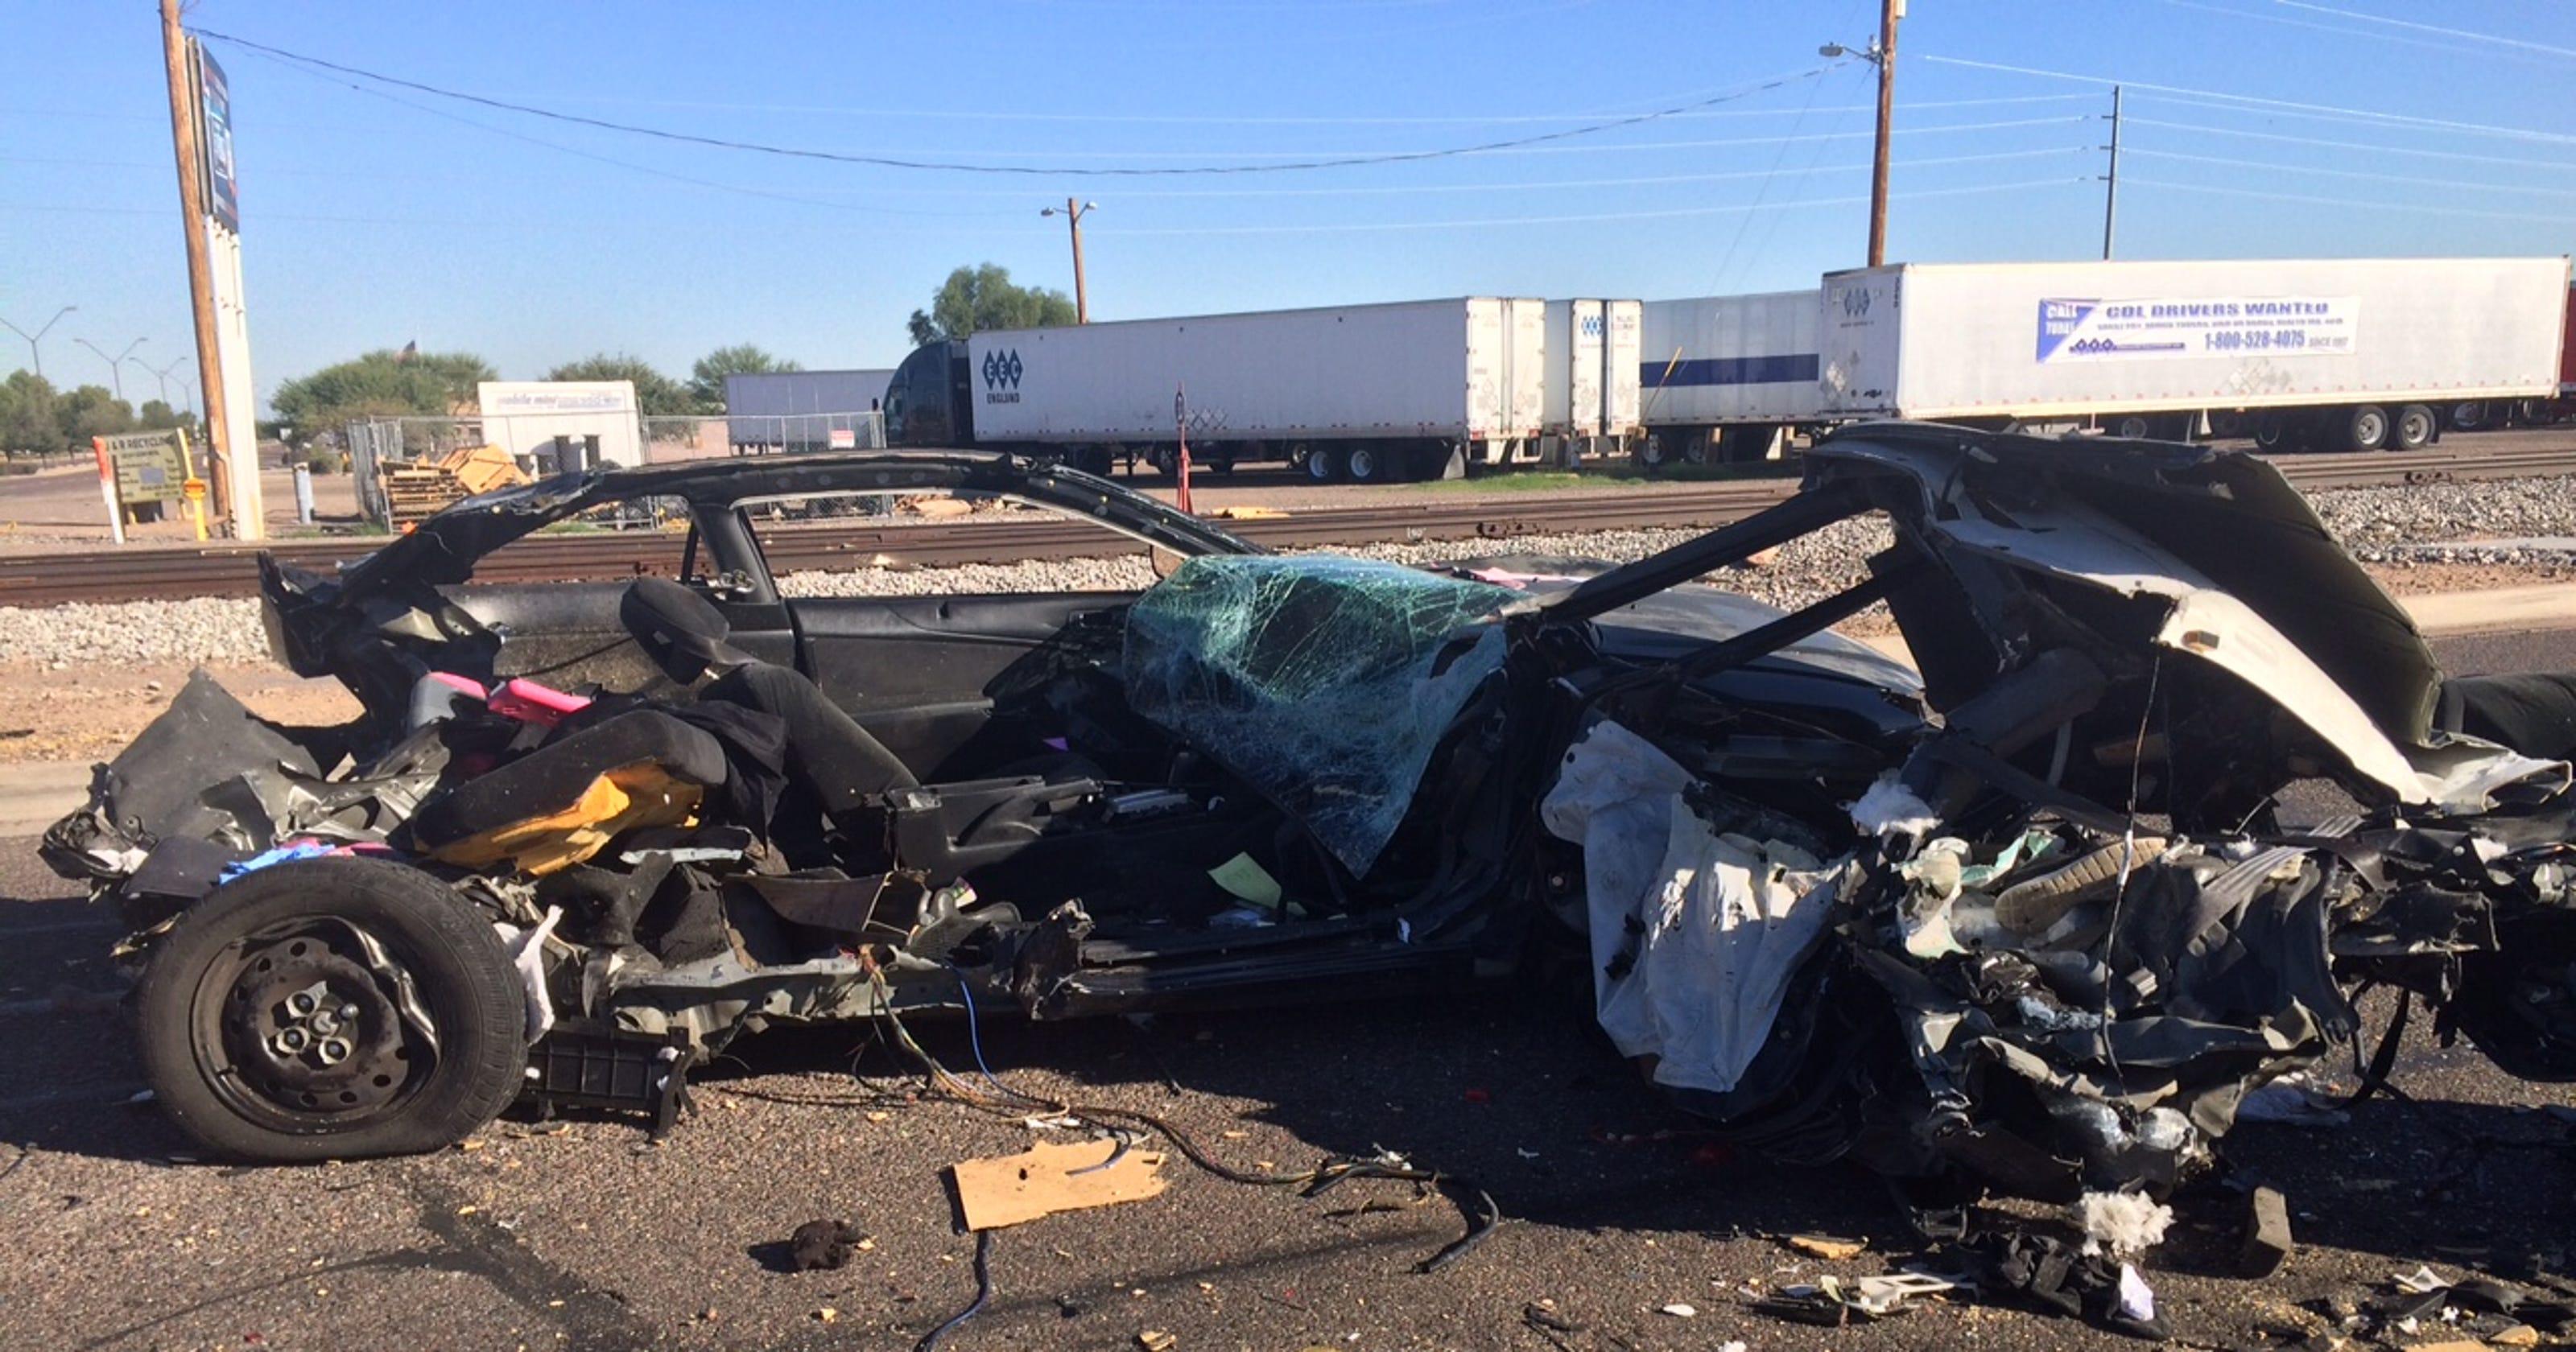 MCSO: Impaired, speeding driver kills 2 in Avondale